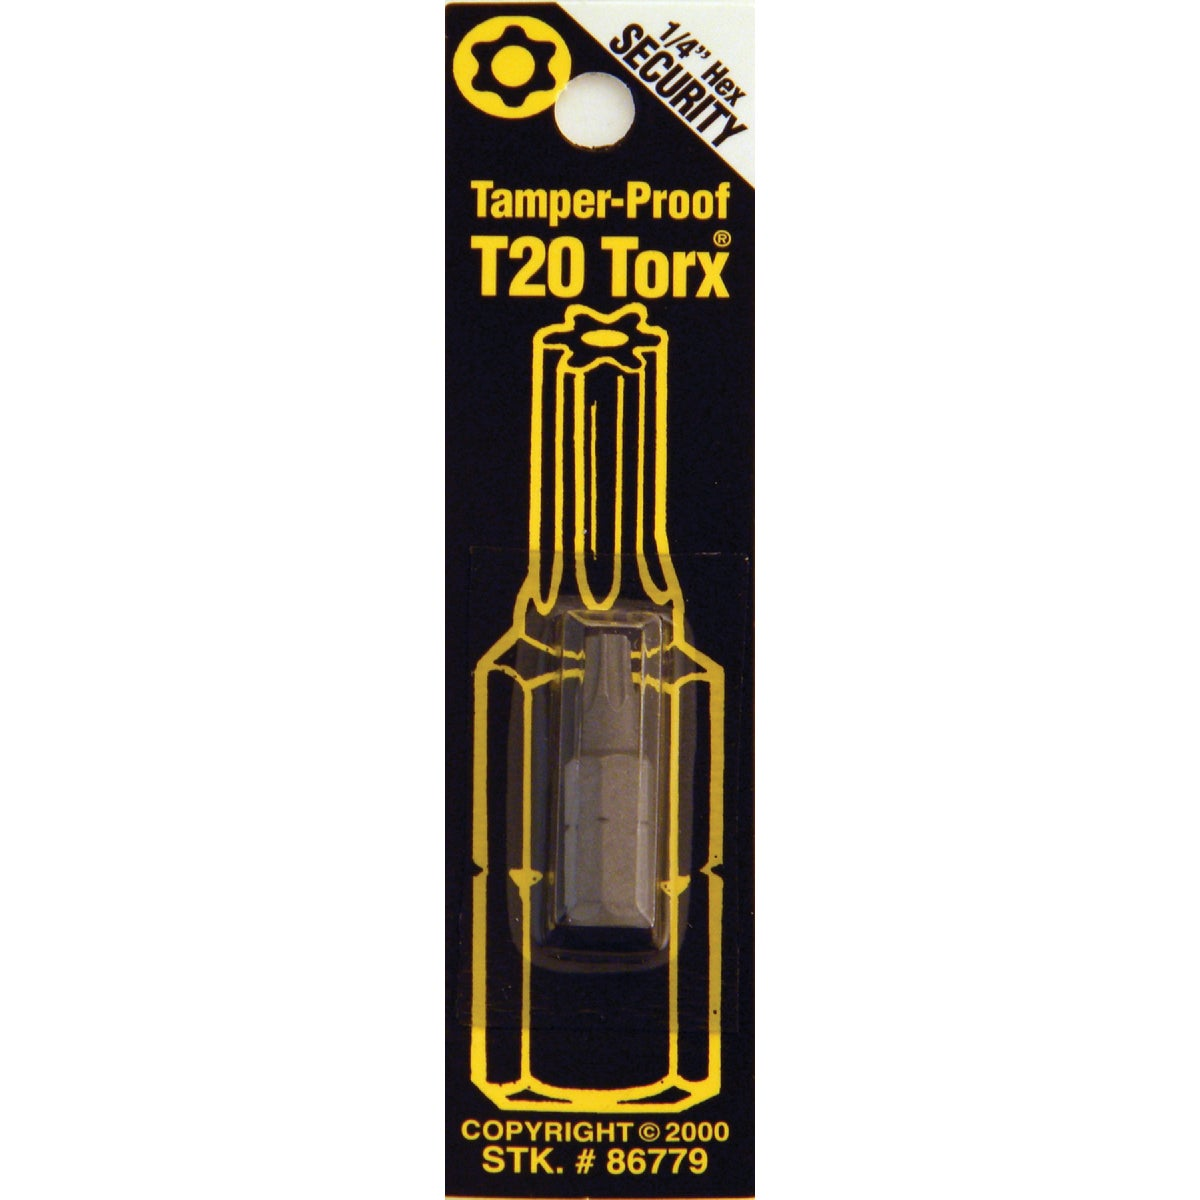 T20 TMPR SECURITY BIT